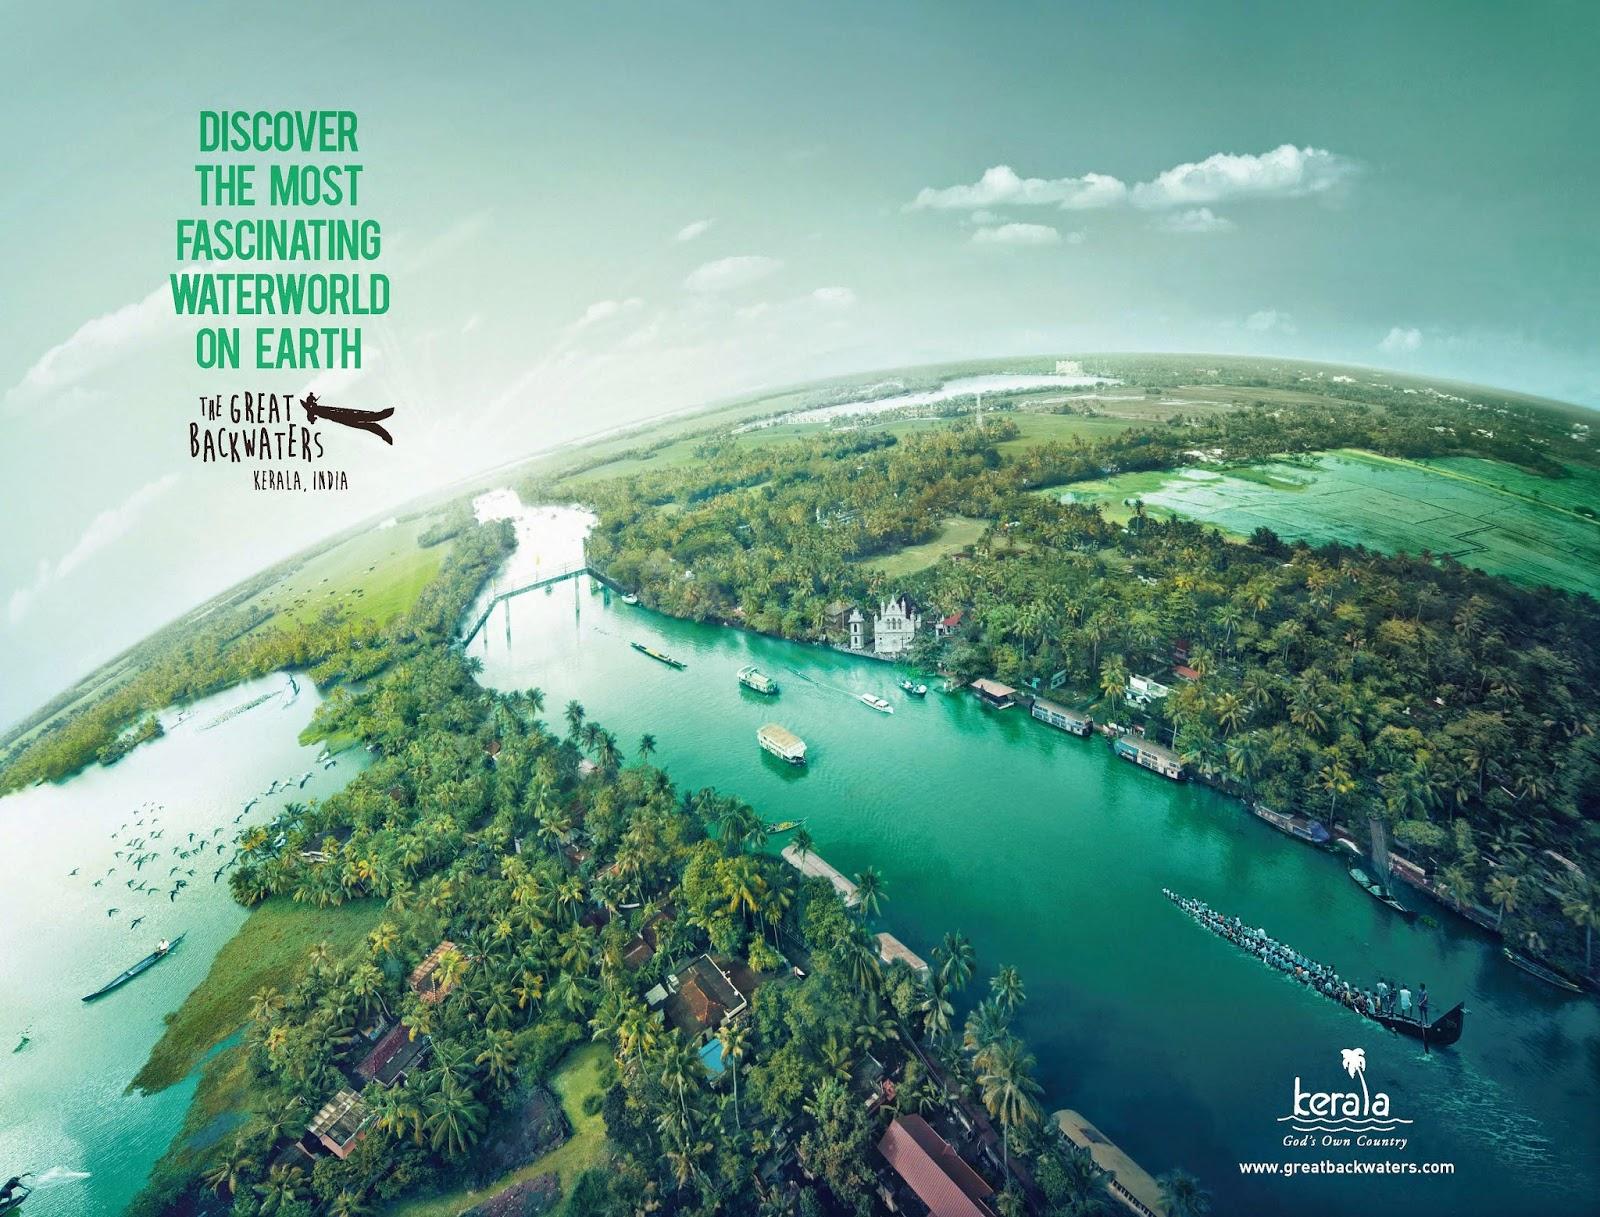 The Great Backwaters Campaign | Kerala Tourism | New Water World - Backwaters of Kerala 2 | Stark Communications Pvt Ltd